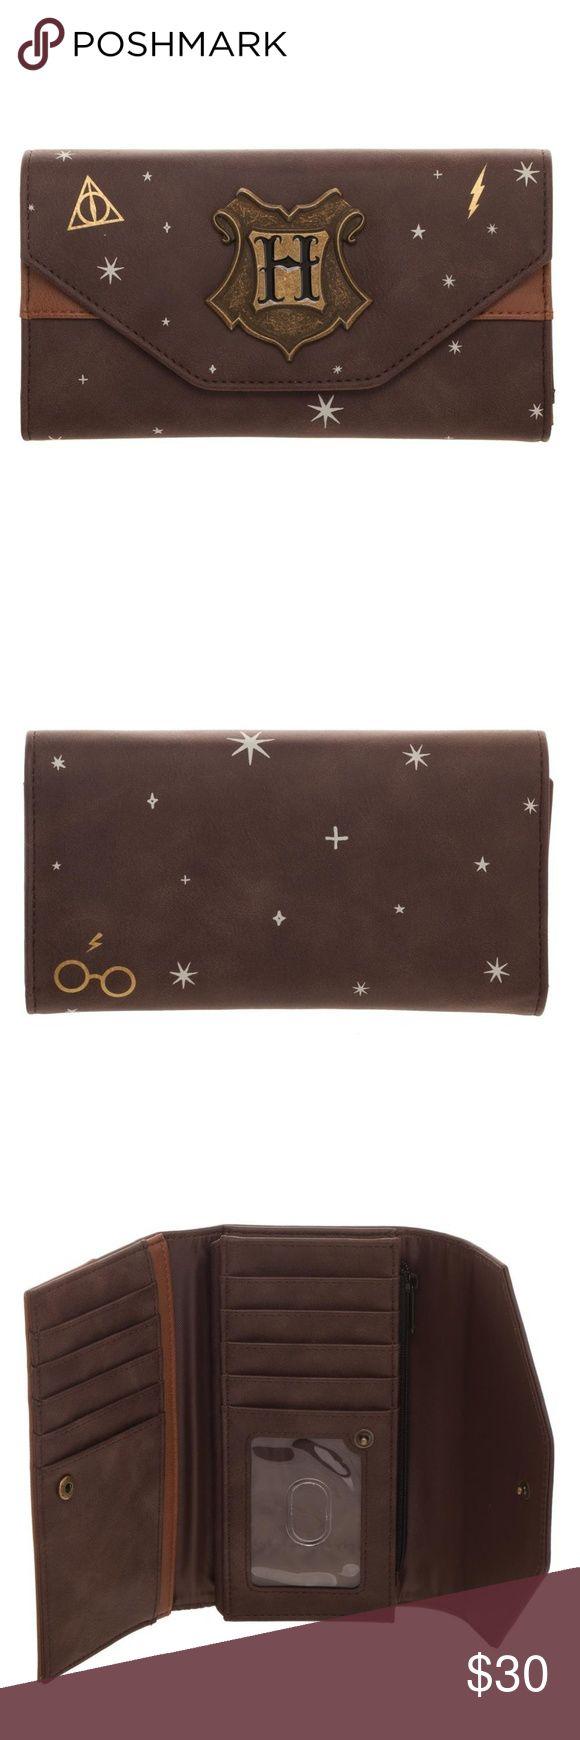 Harry Potter Foldover Flap Wallet Damen Hogwarts Boutique